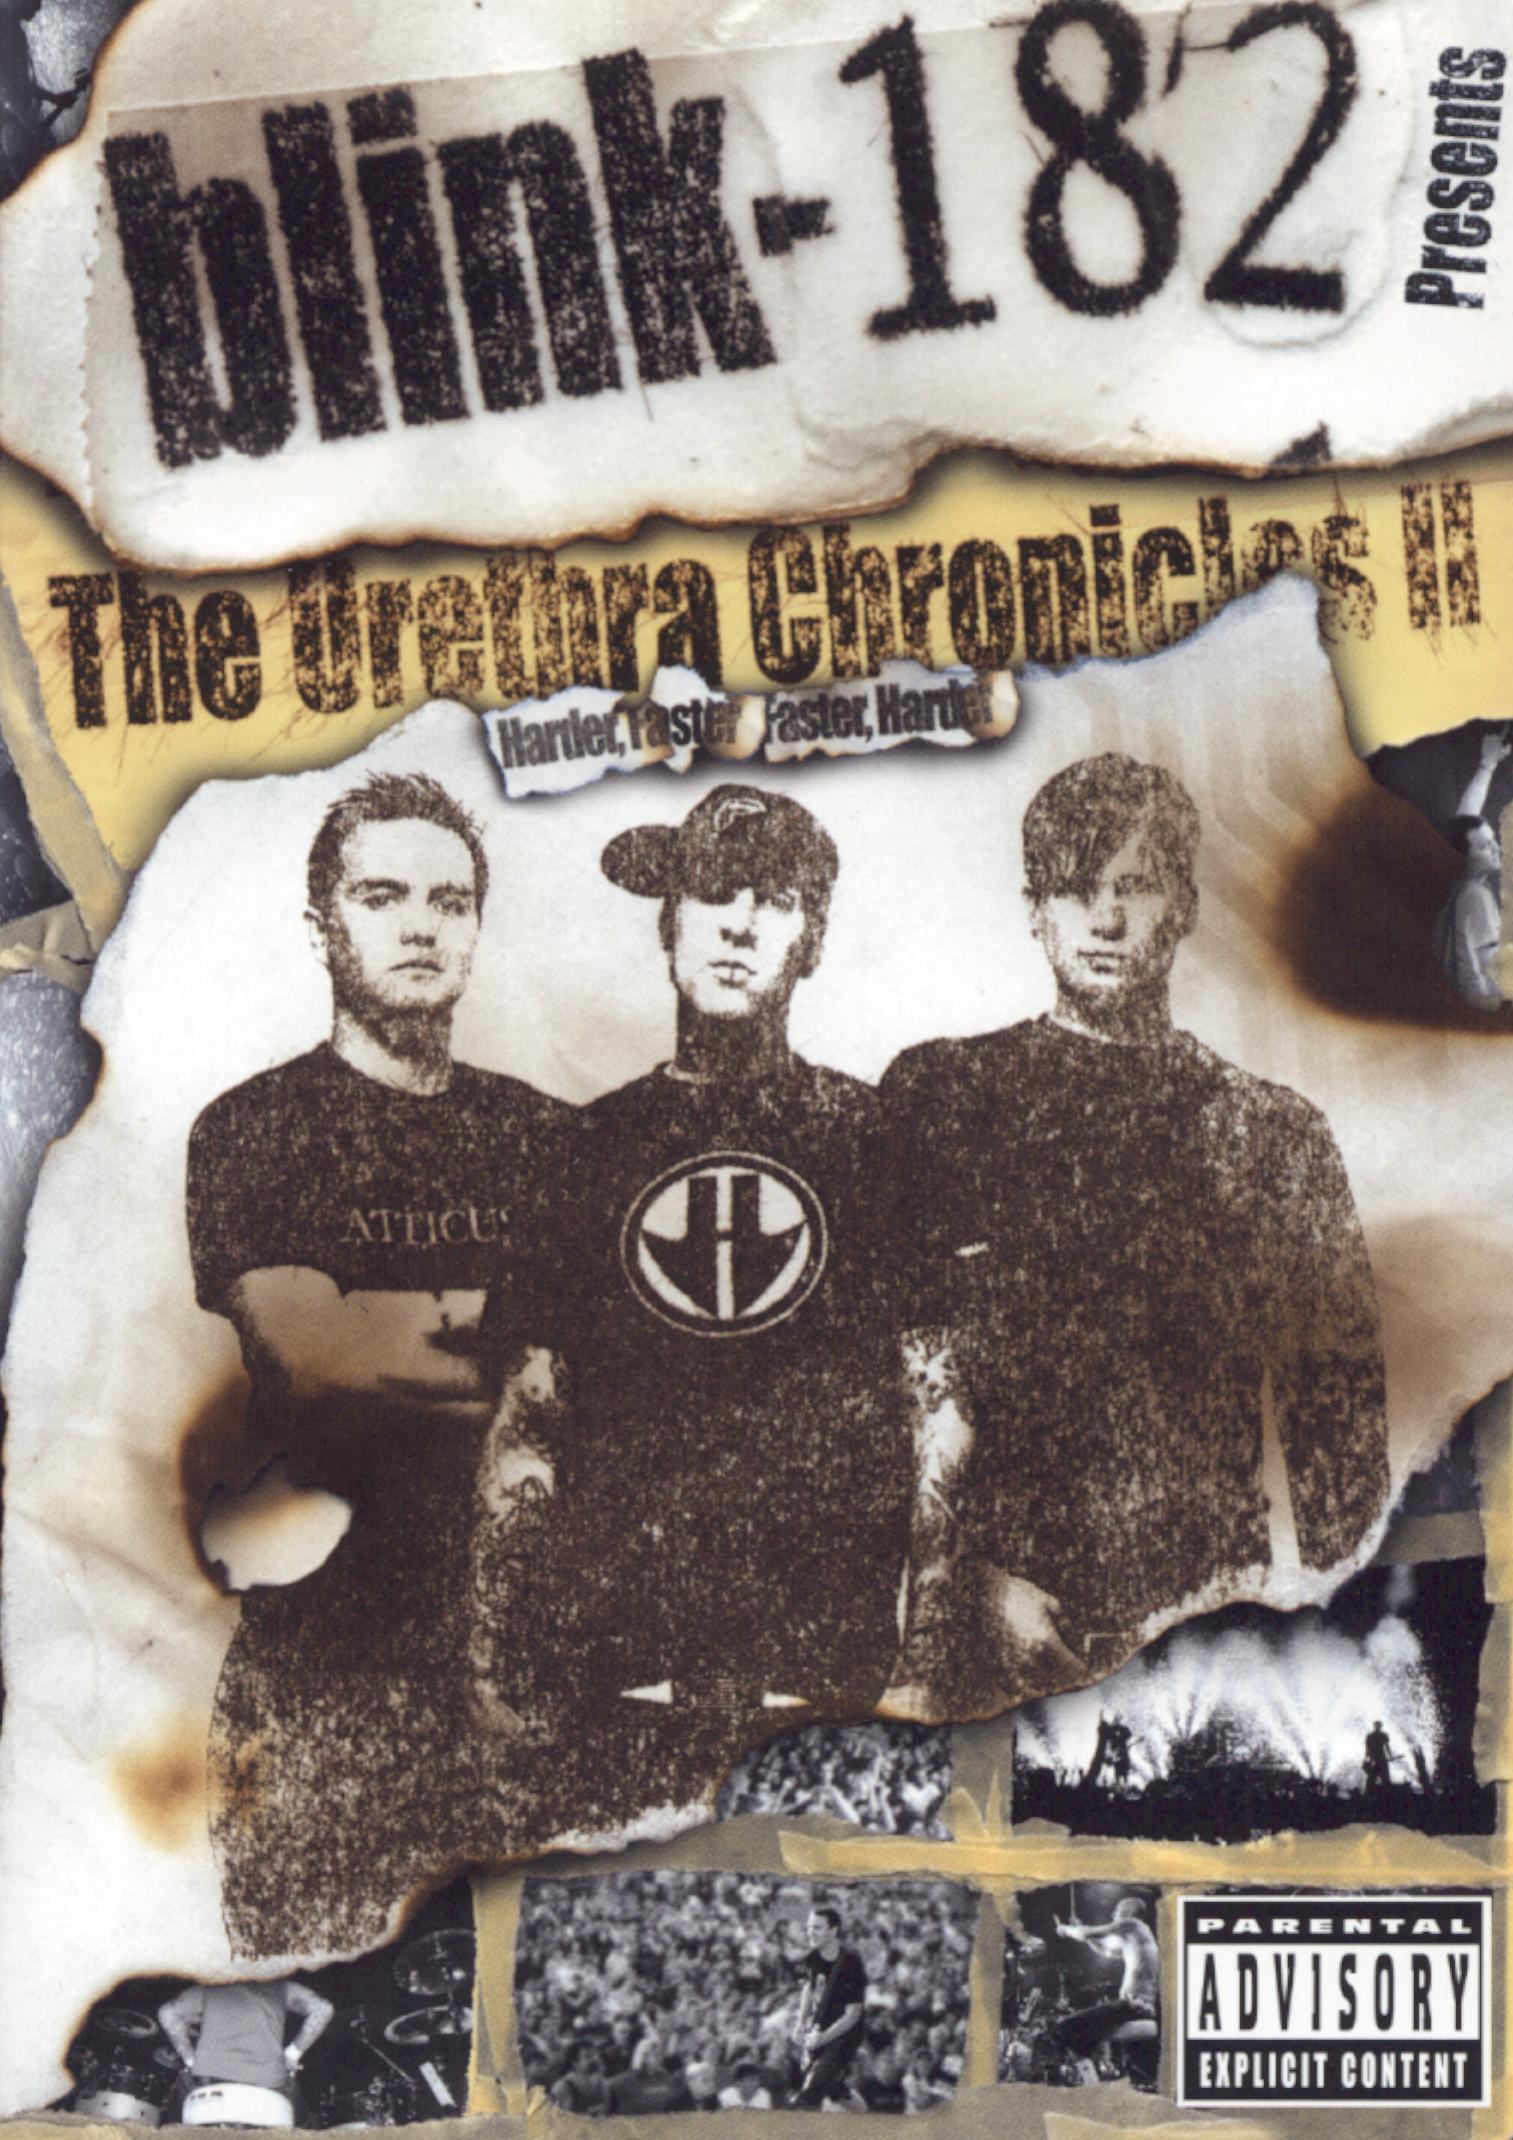 Blink 182: Urethra Chronicles, Vol. II - Harder Faster Faster Harder